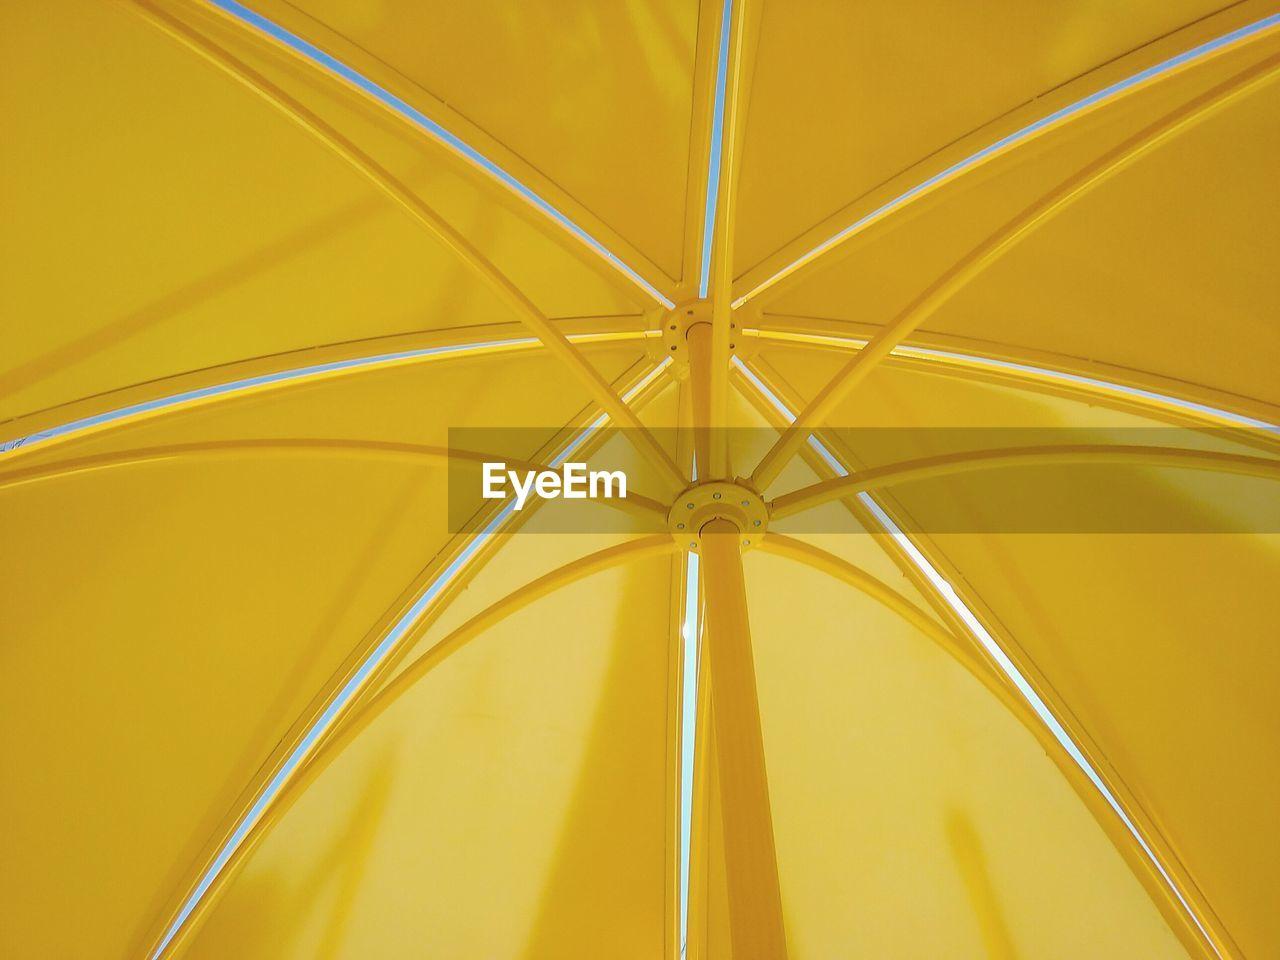 Full frame shot of yellow umbrella